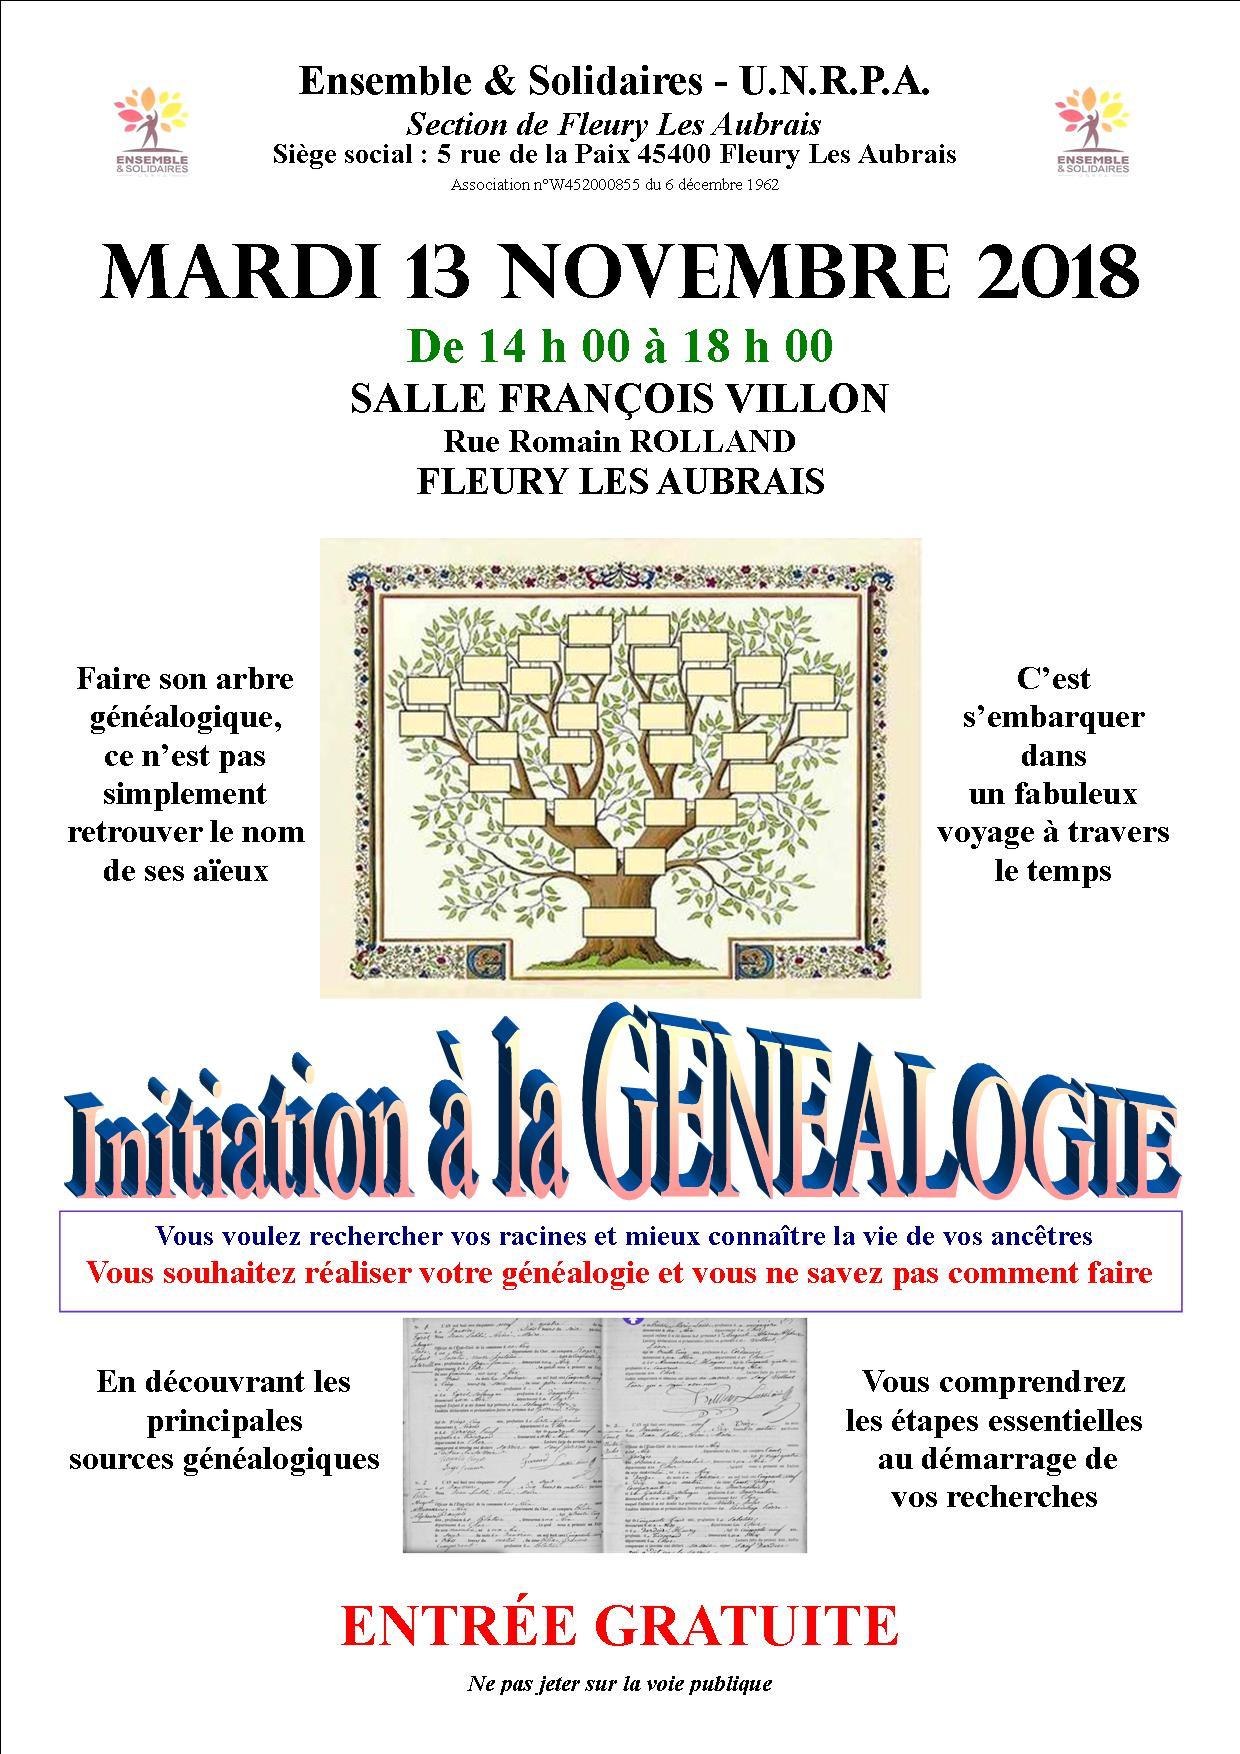 Affiche généalogie 13 11 2018 v1.jpg